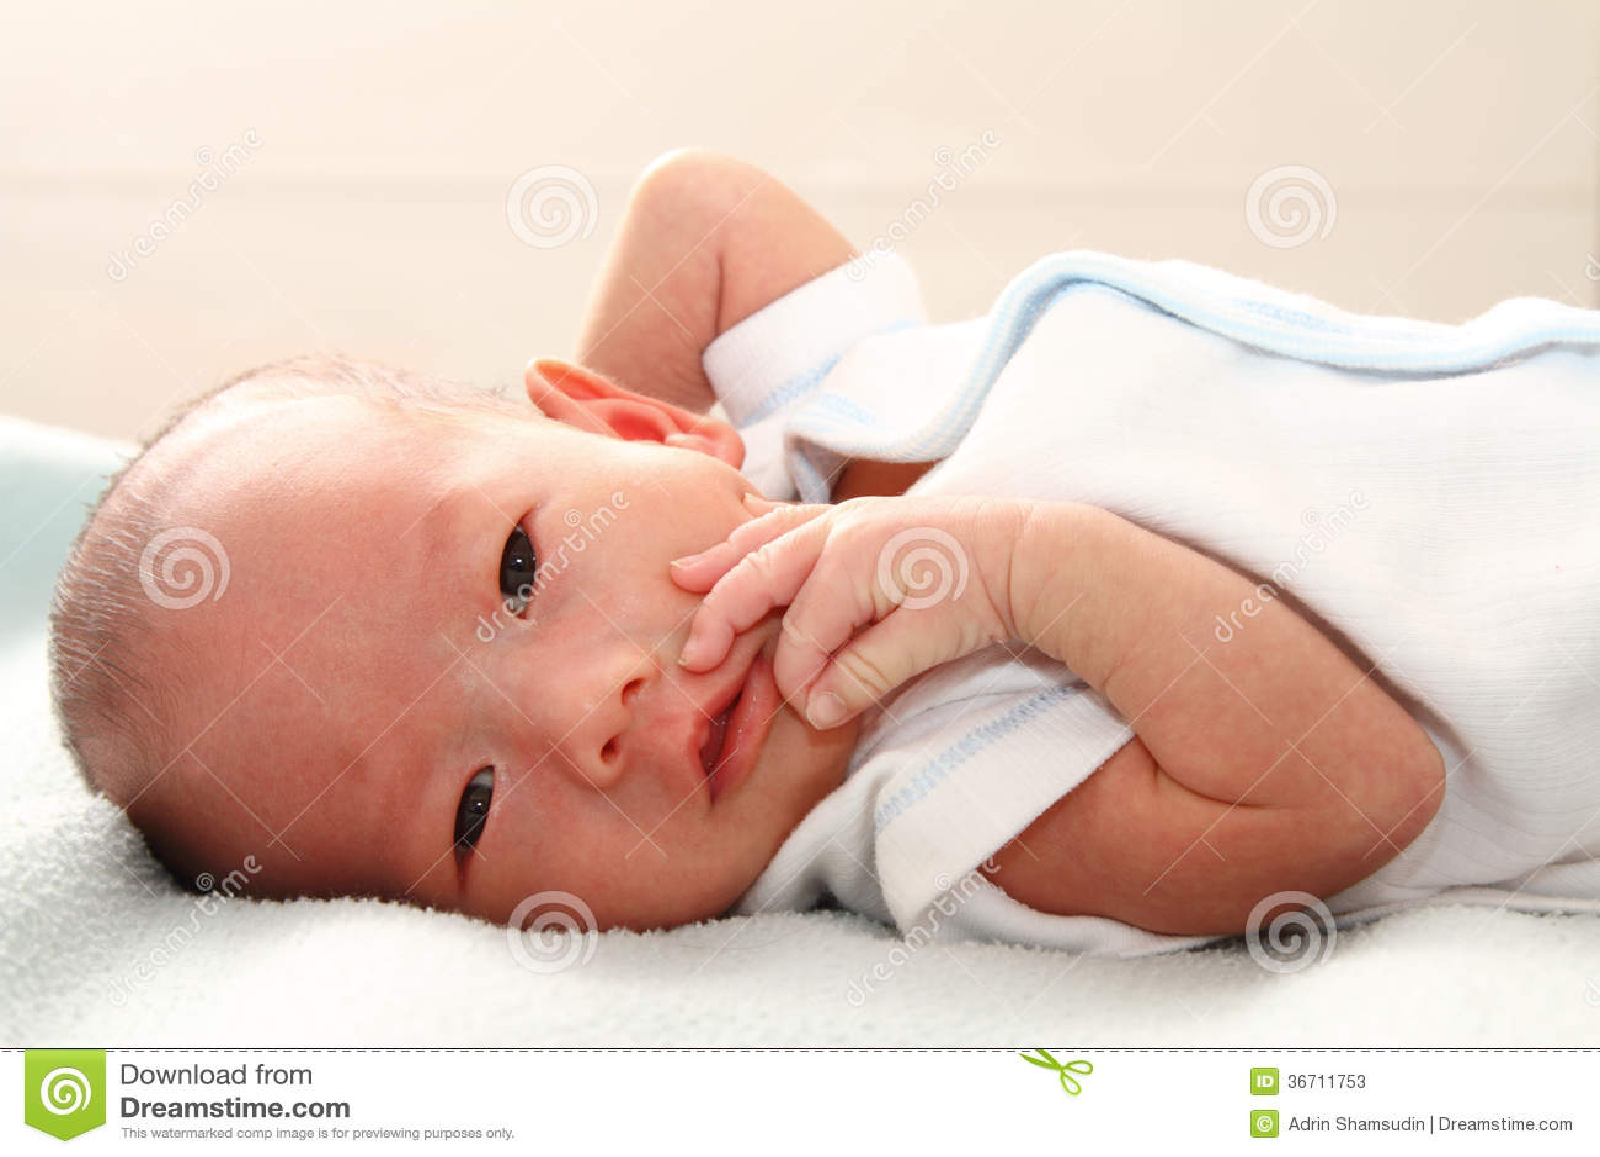 Baby Boy Posing Stock Photos - Image: 36711753 Newborn Boy Photography Poses